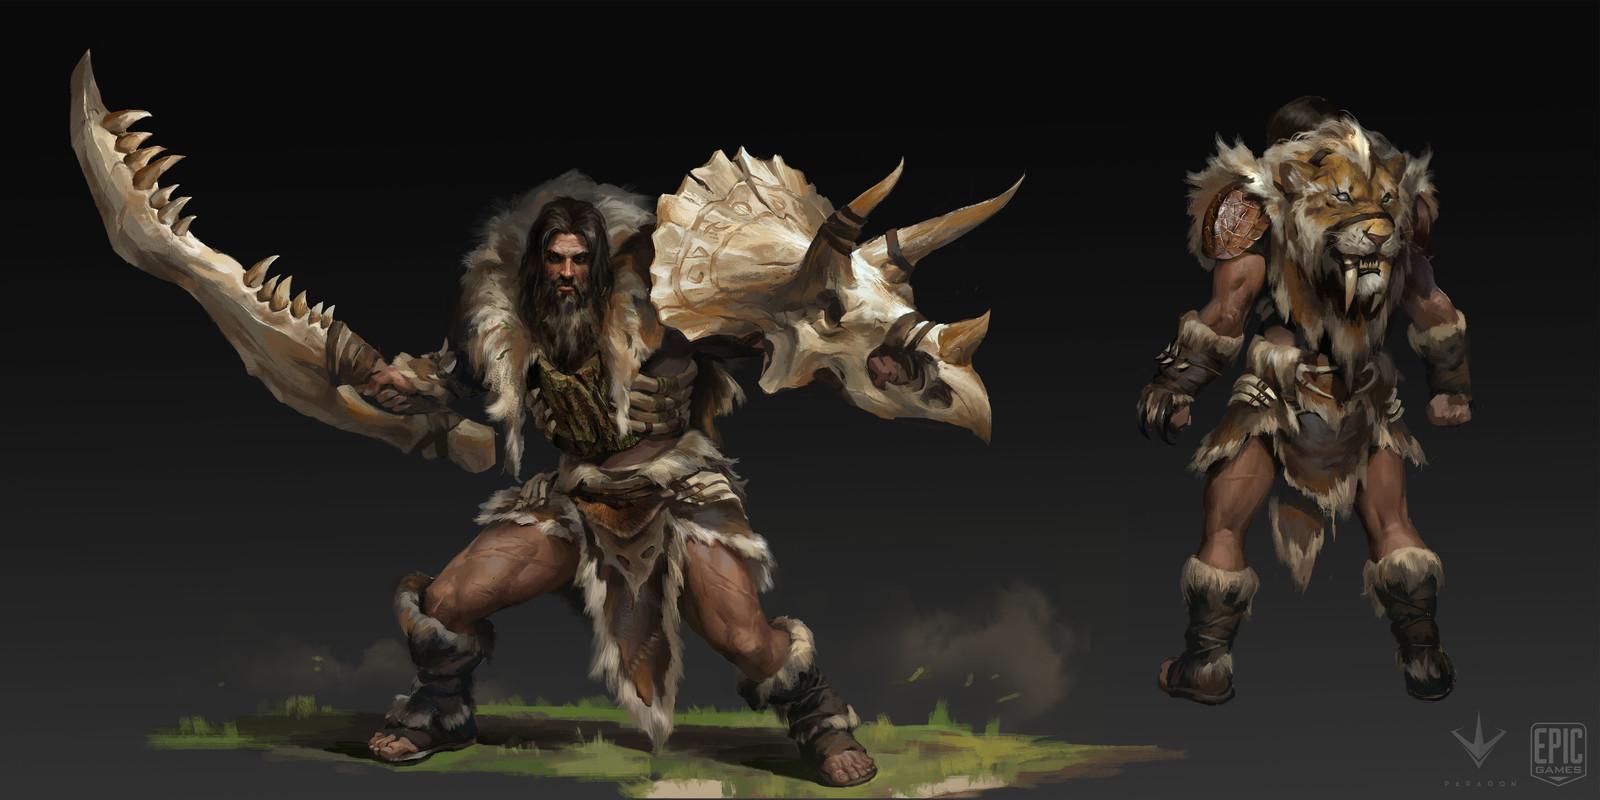 5.Greystone cave man original concept : Paul Richards